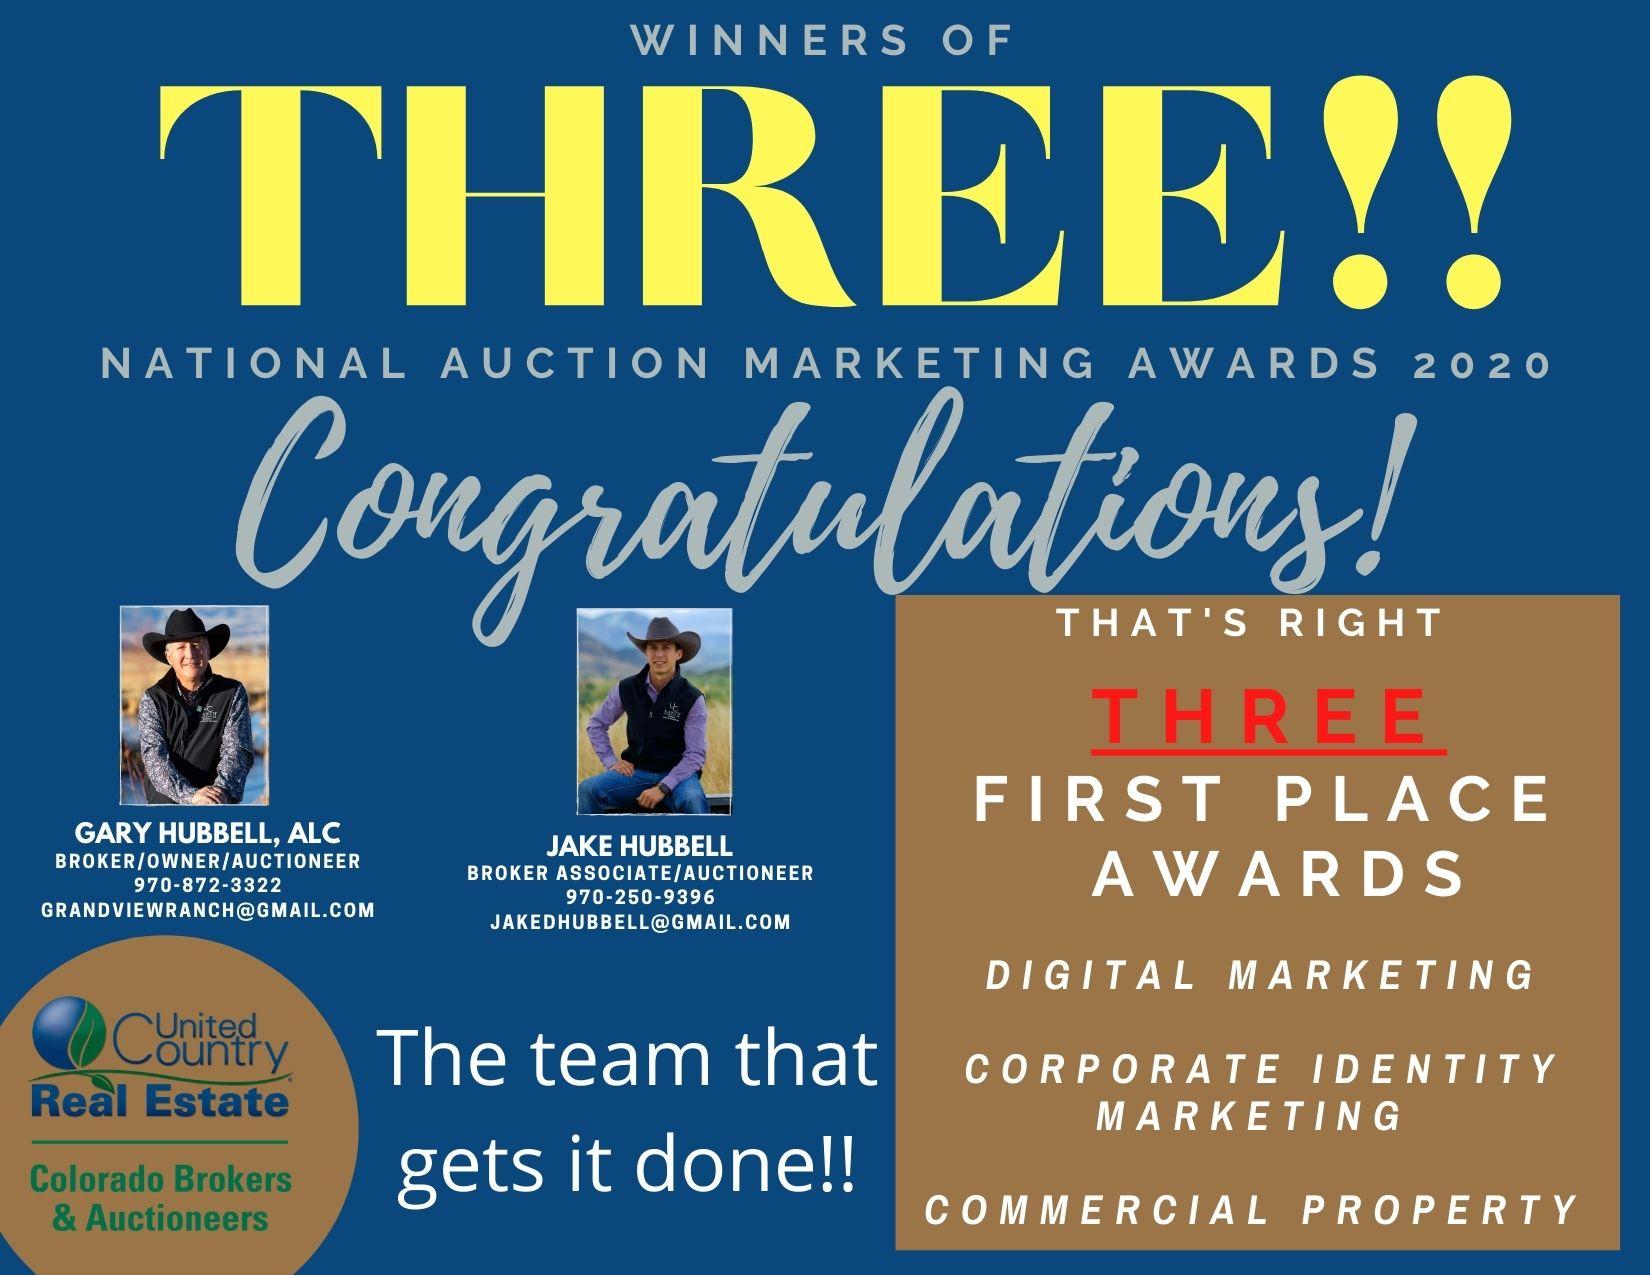 Hotchkiss CO UC Office Wins Three National Auction Marketing Awards